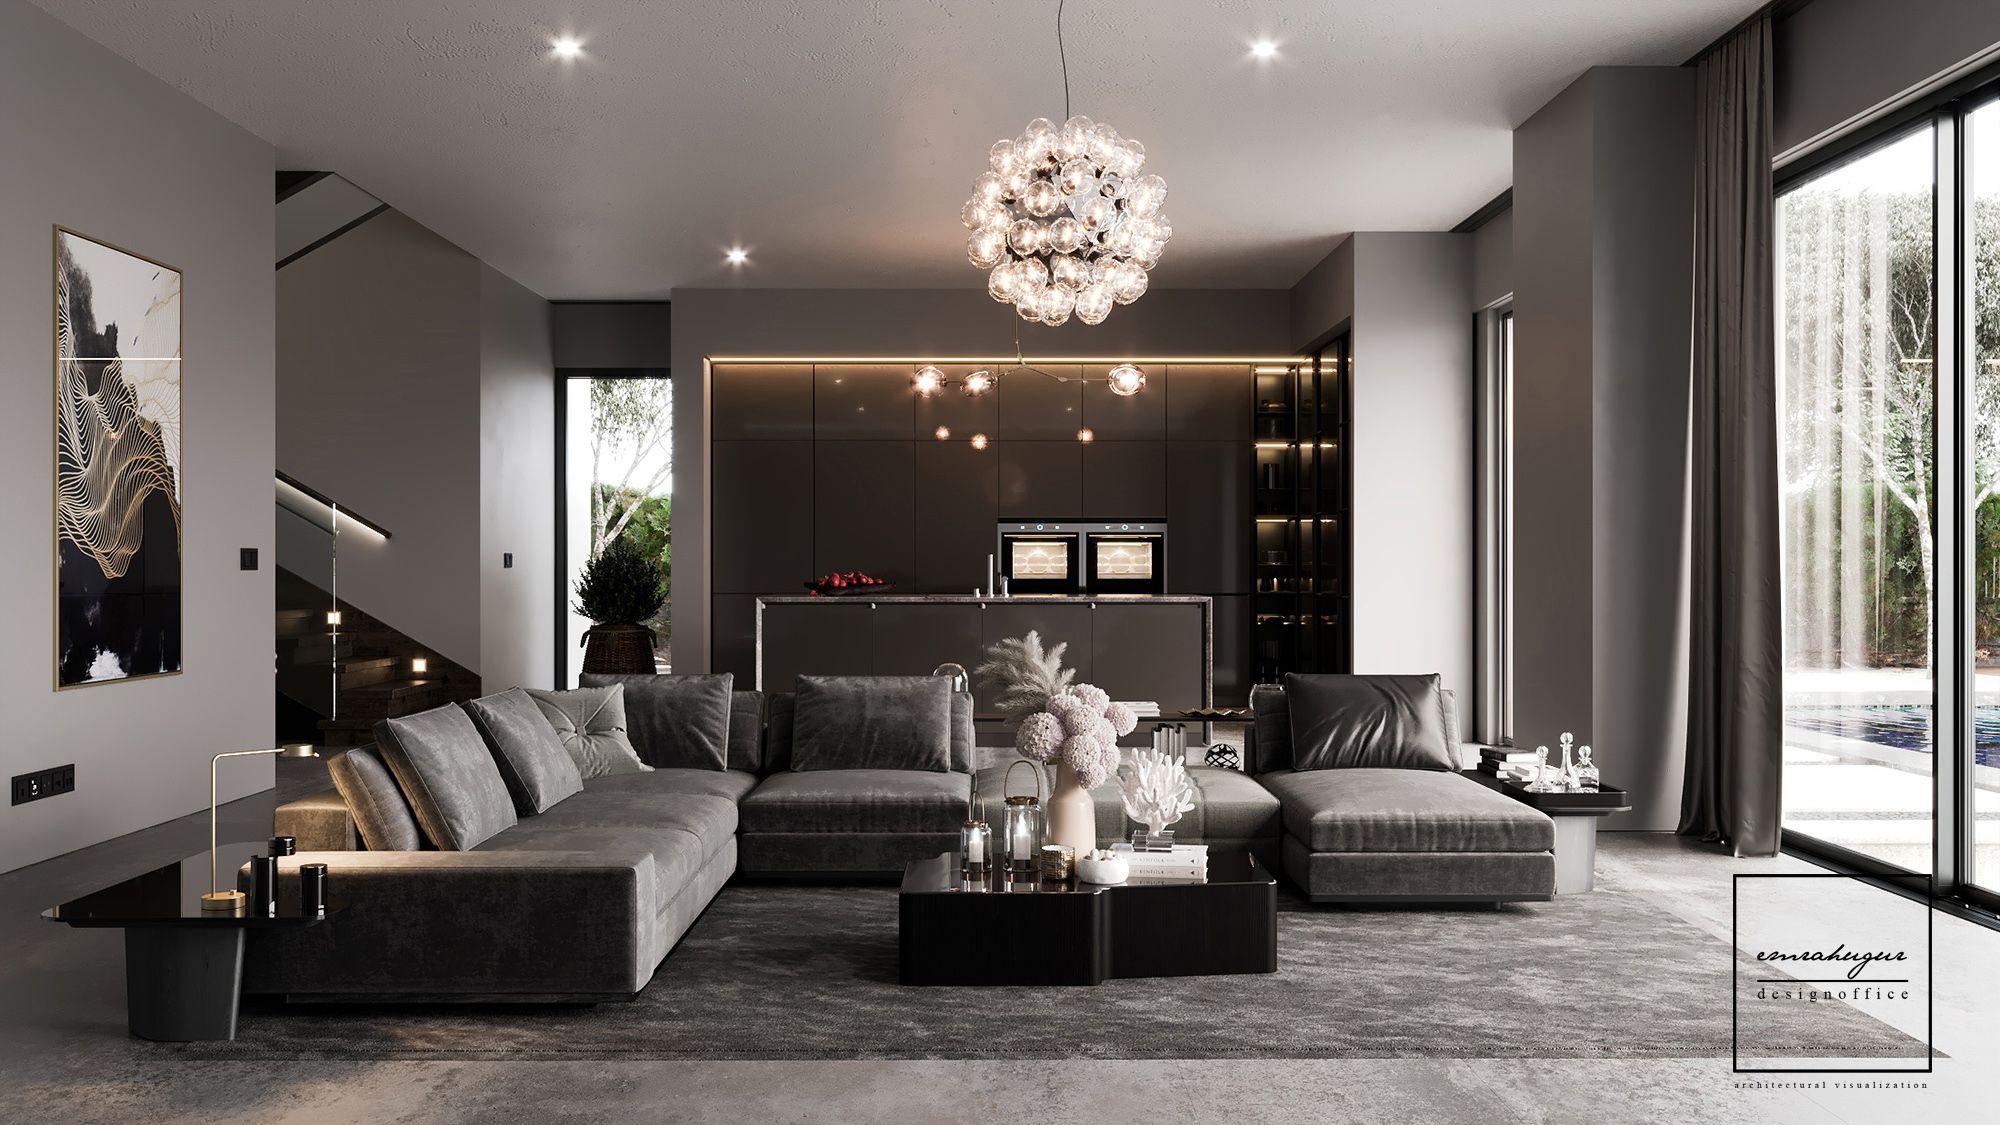 Livingroom Design Living Room Designs Living Room House Interior Nice living room ideas